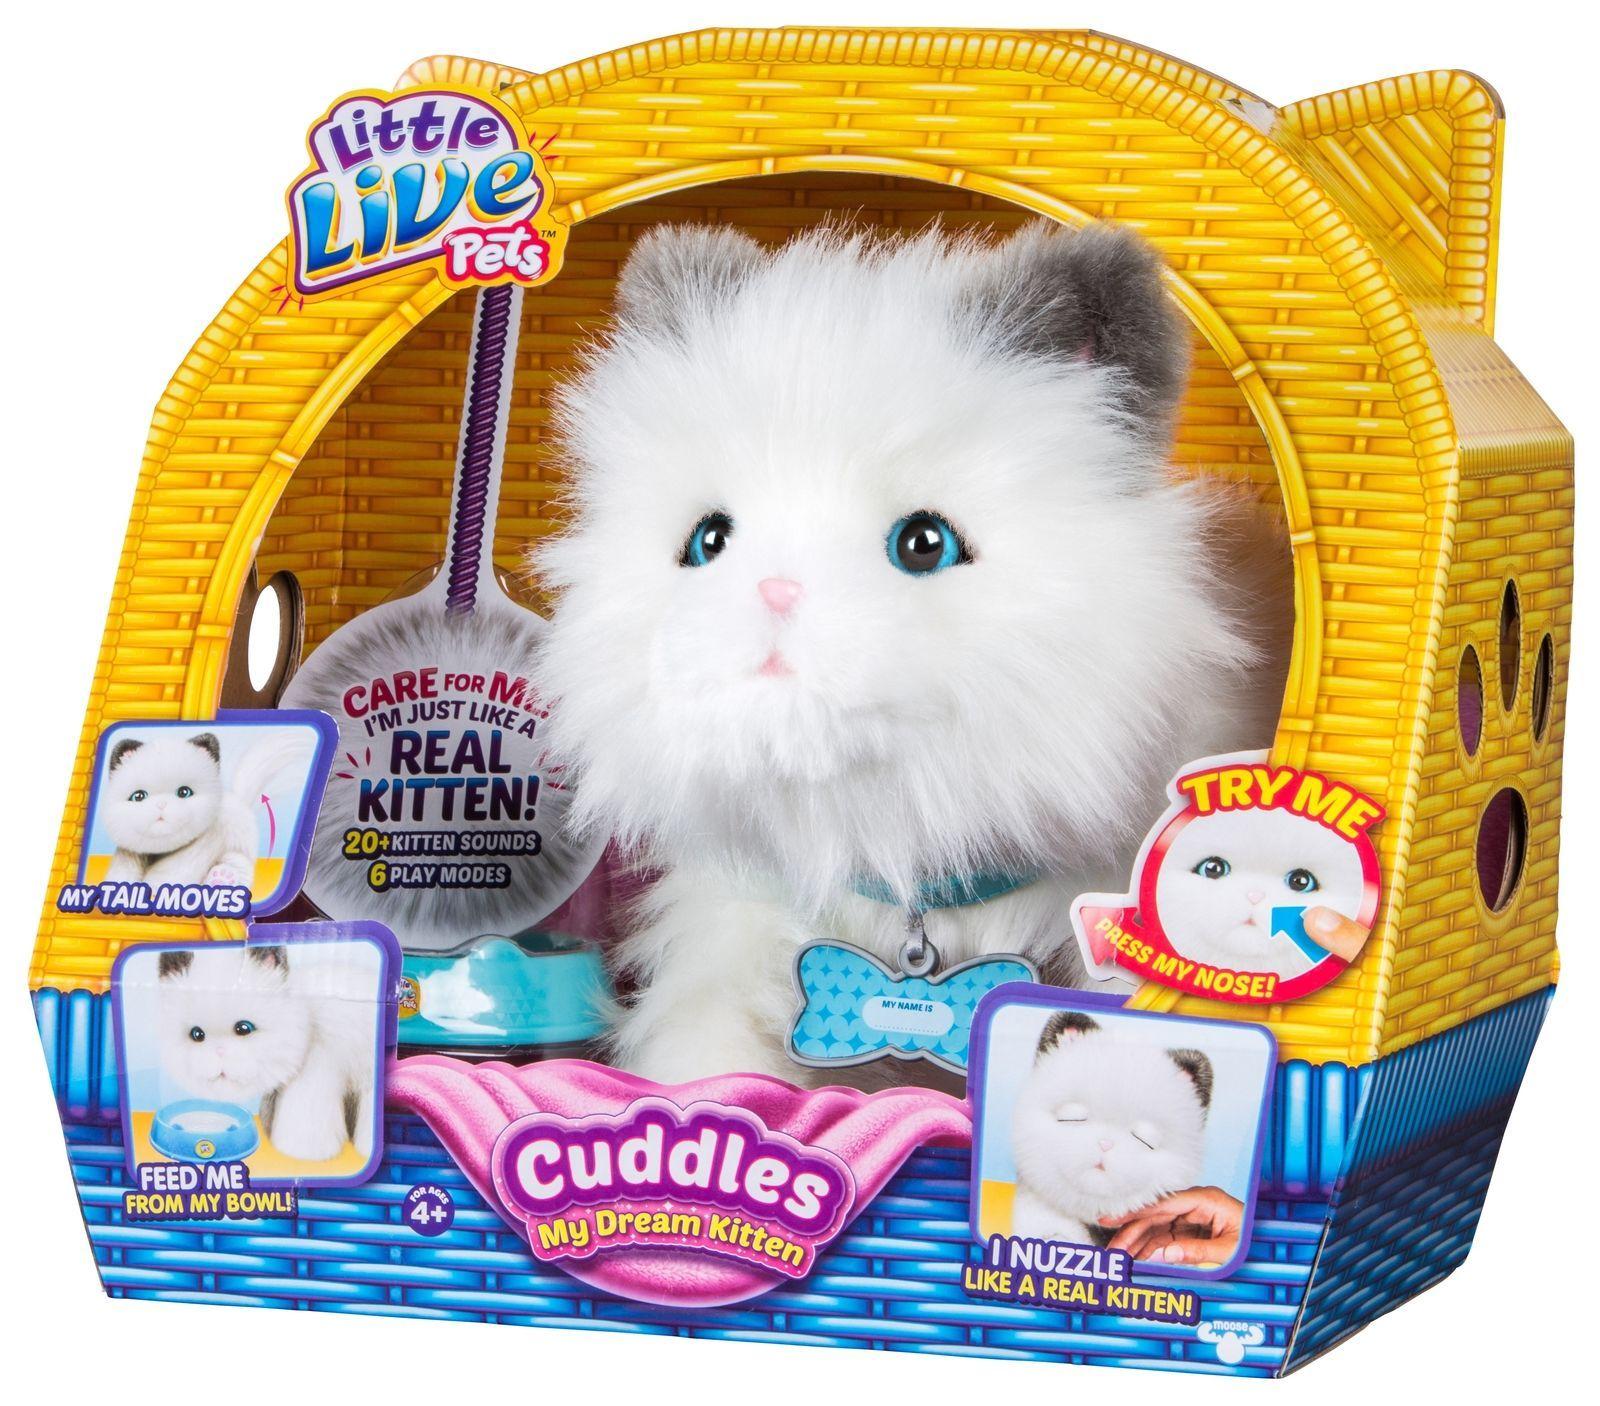 New Cuddles My Dream Kitten Little Live Pet Cat Interactive Motion Adoption Purr Ebay Little Live Pets Pets Cuddling Kitten Plush Toy